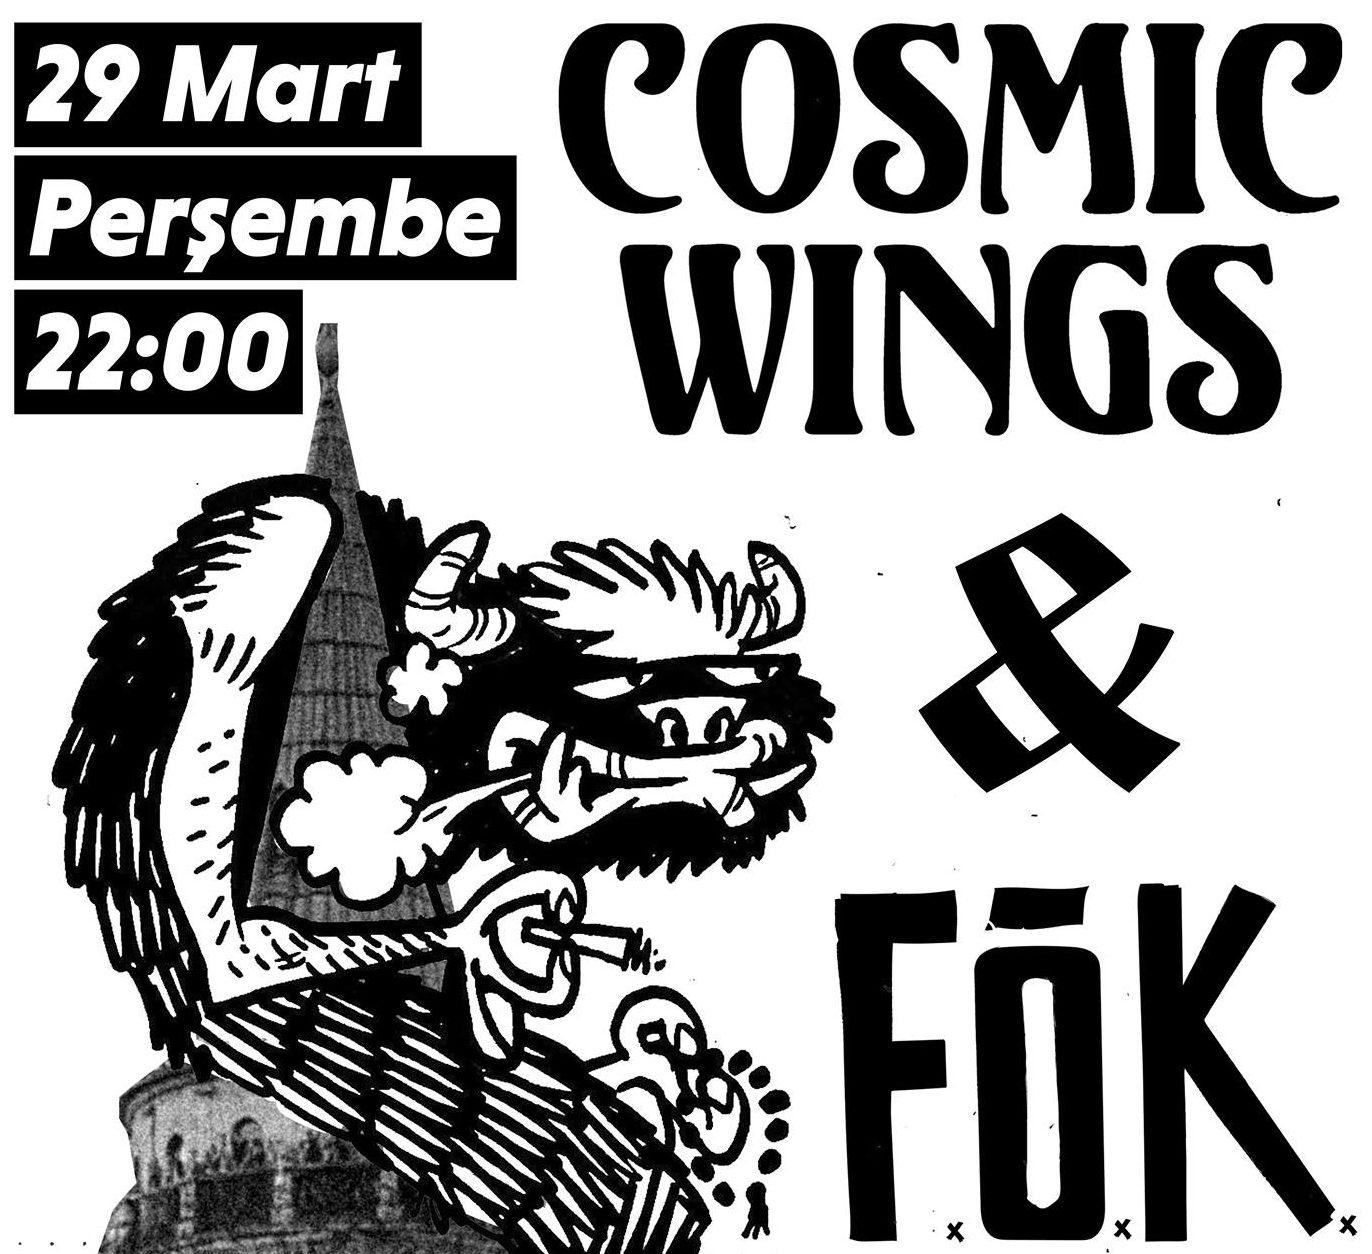 Cosmic Wings + FÖK, 29 Mart Perşembe, Peyote